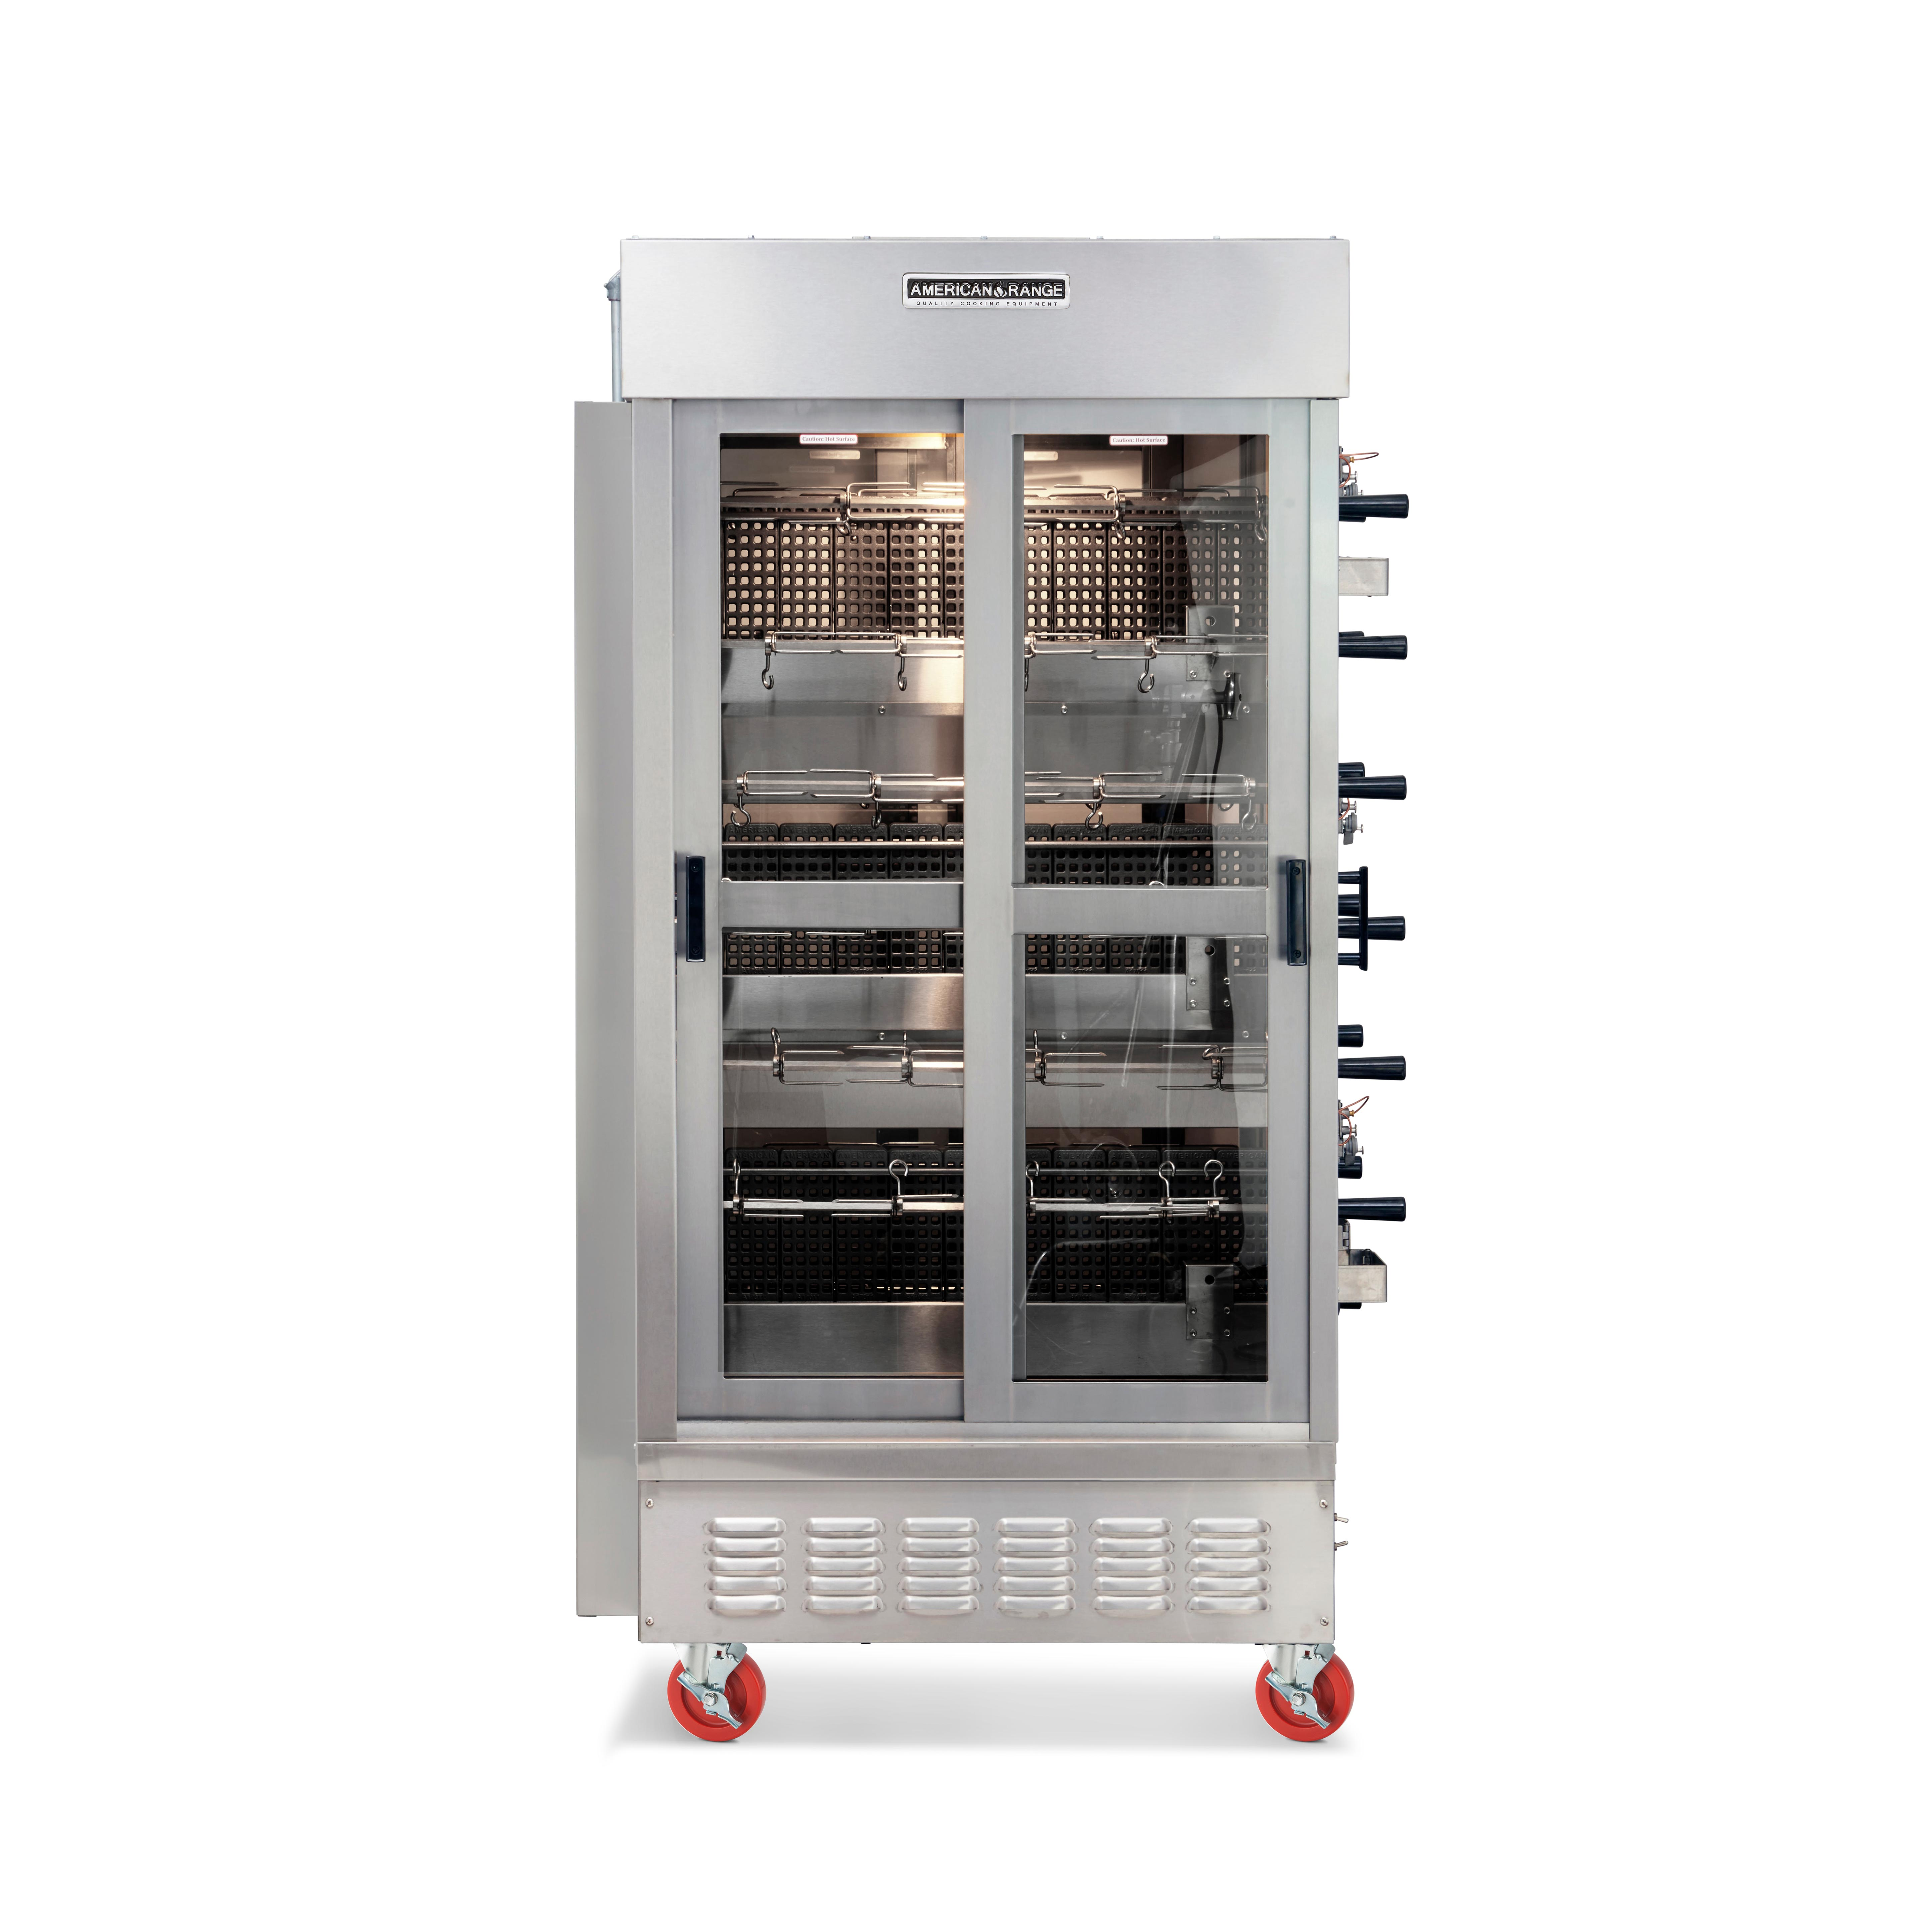 American Range ACB-7 oven, gas, rotisserie